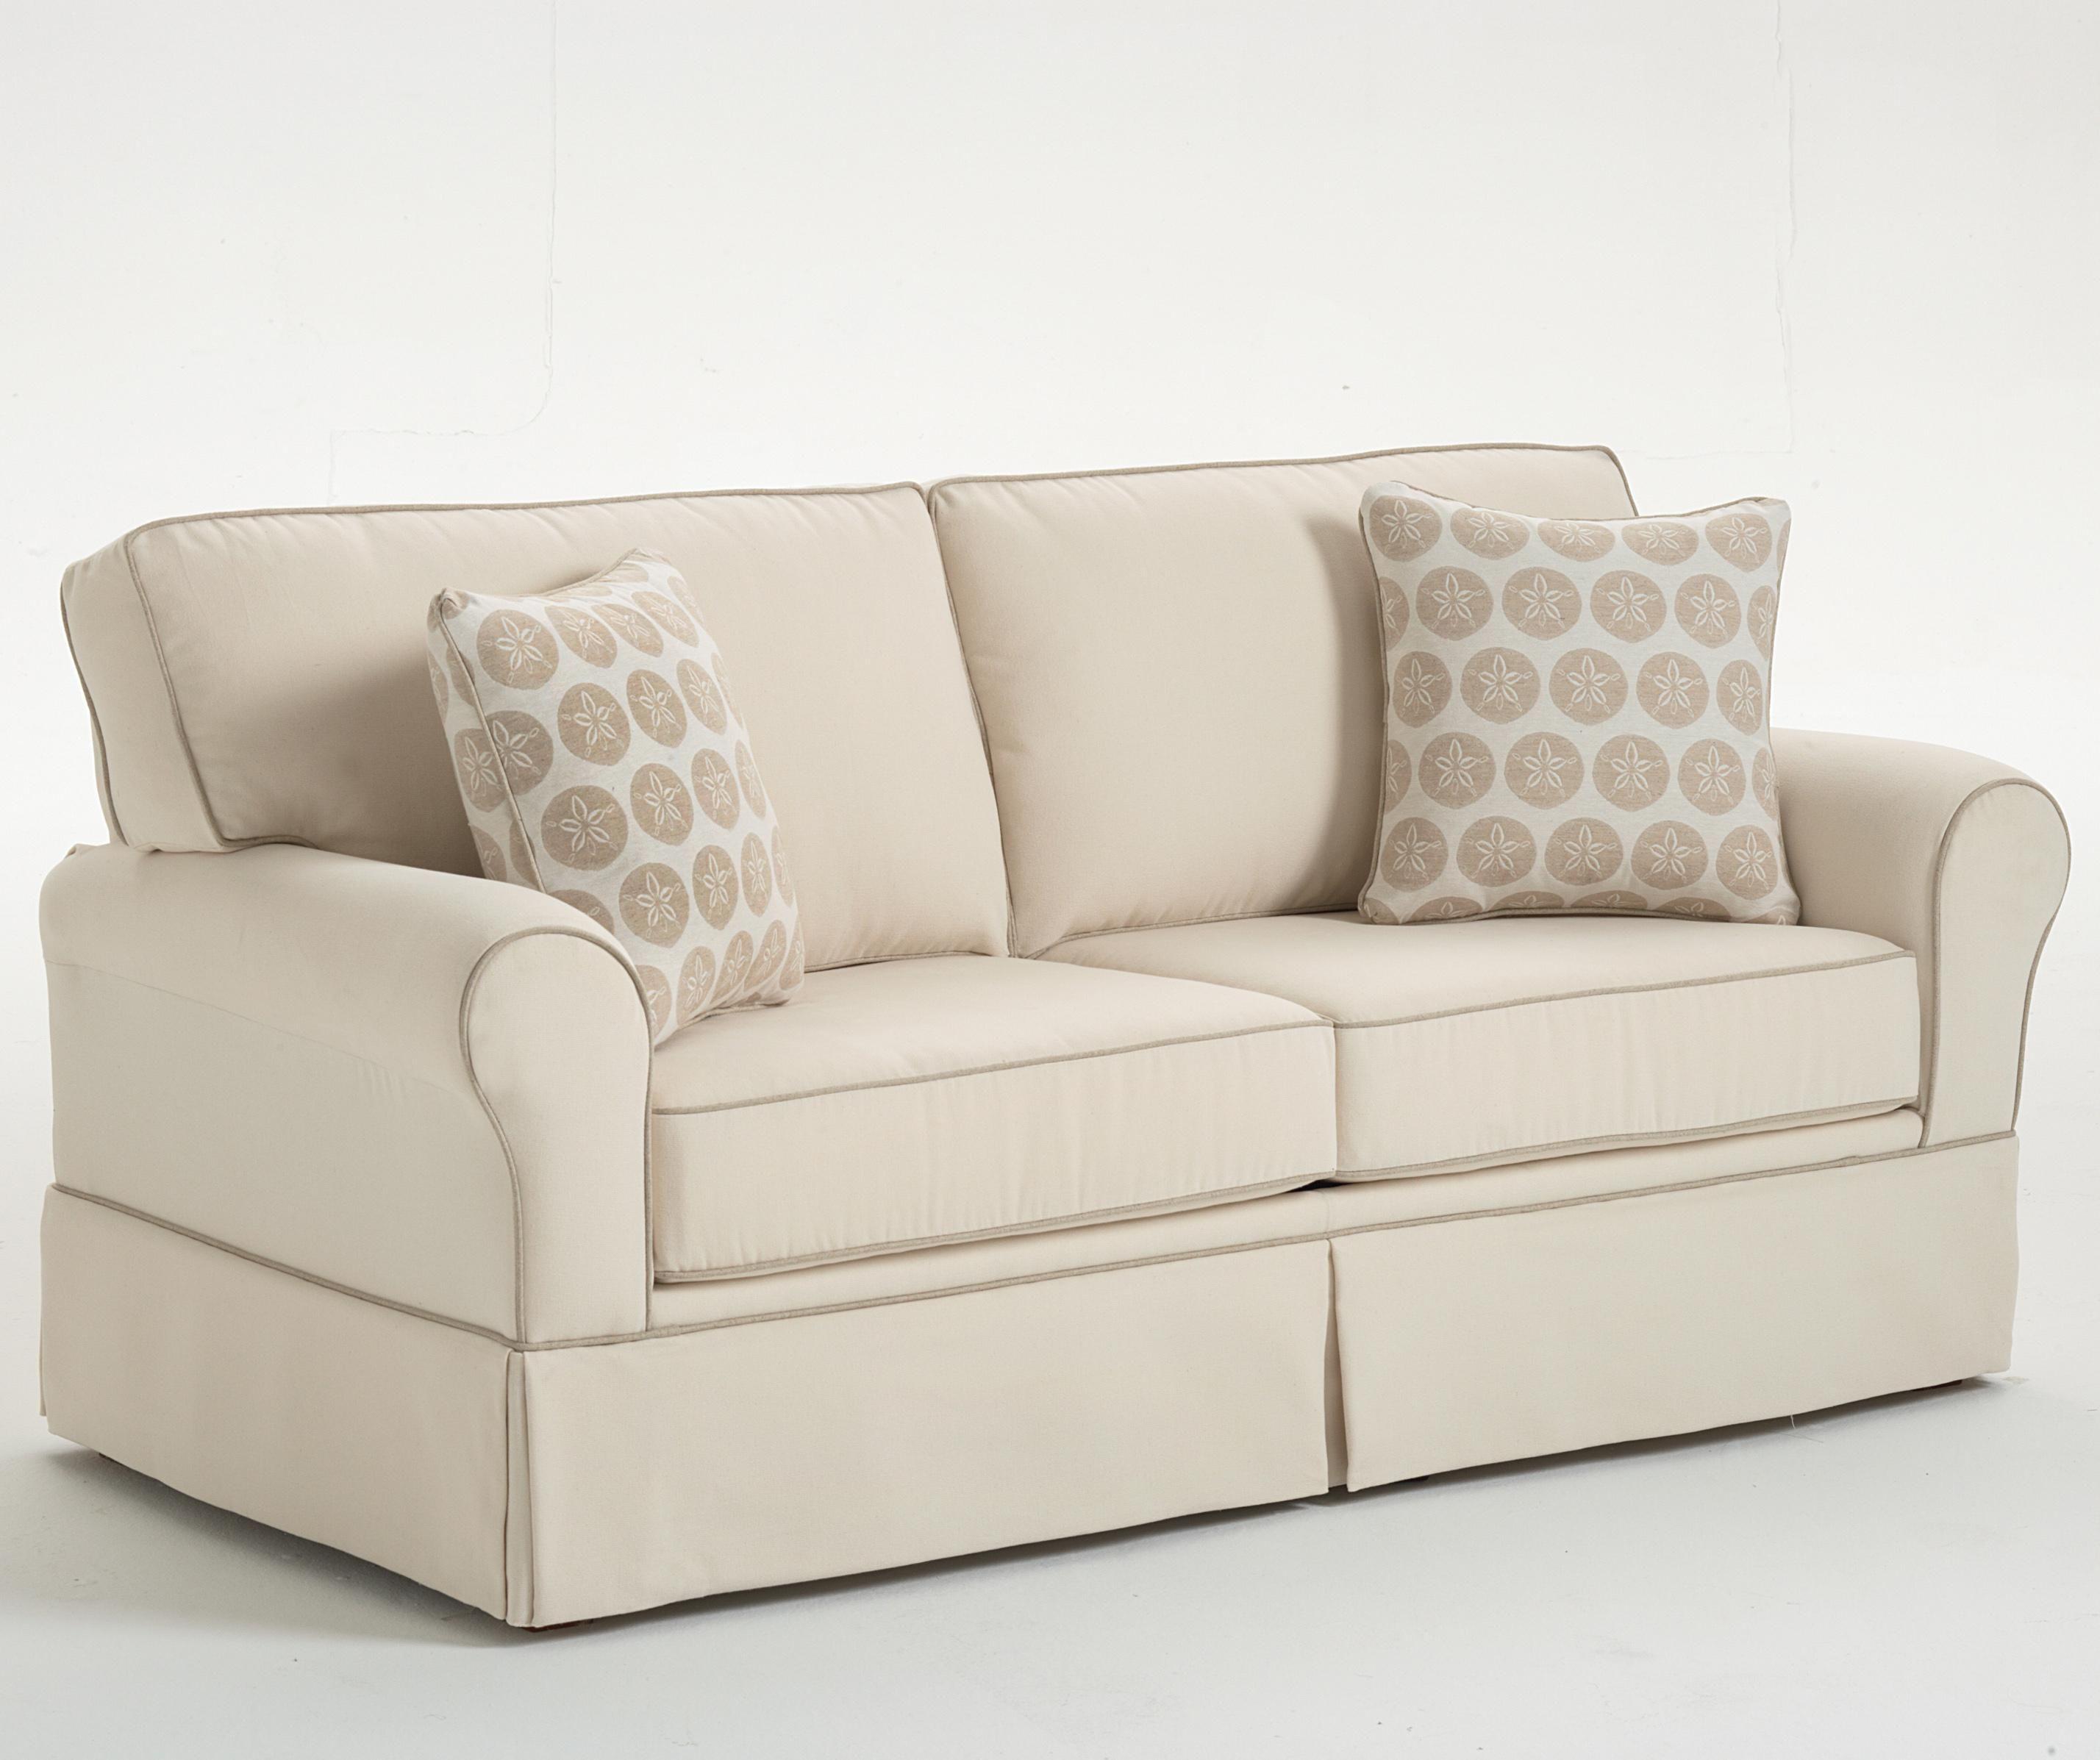 Chesapeake Two Seat Sleeper Sofa by Thomasville